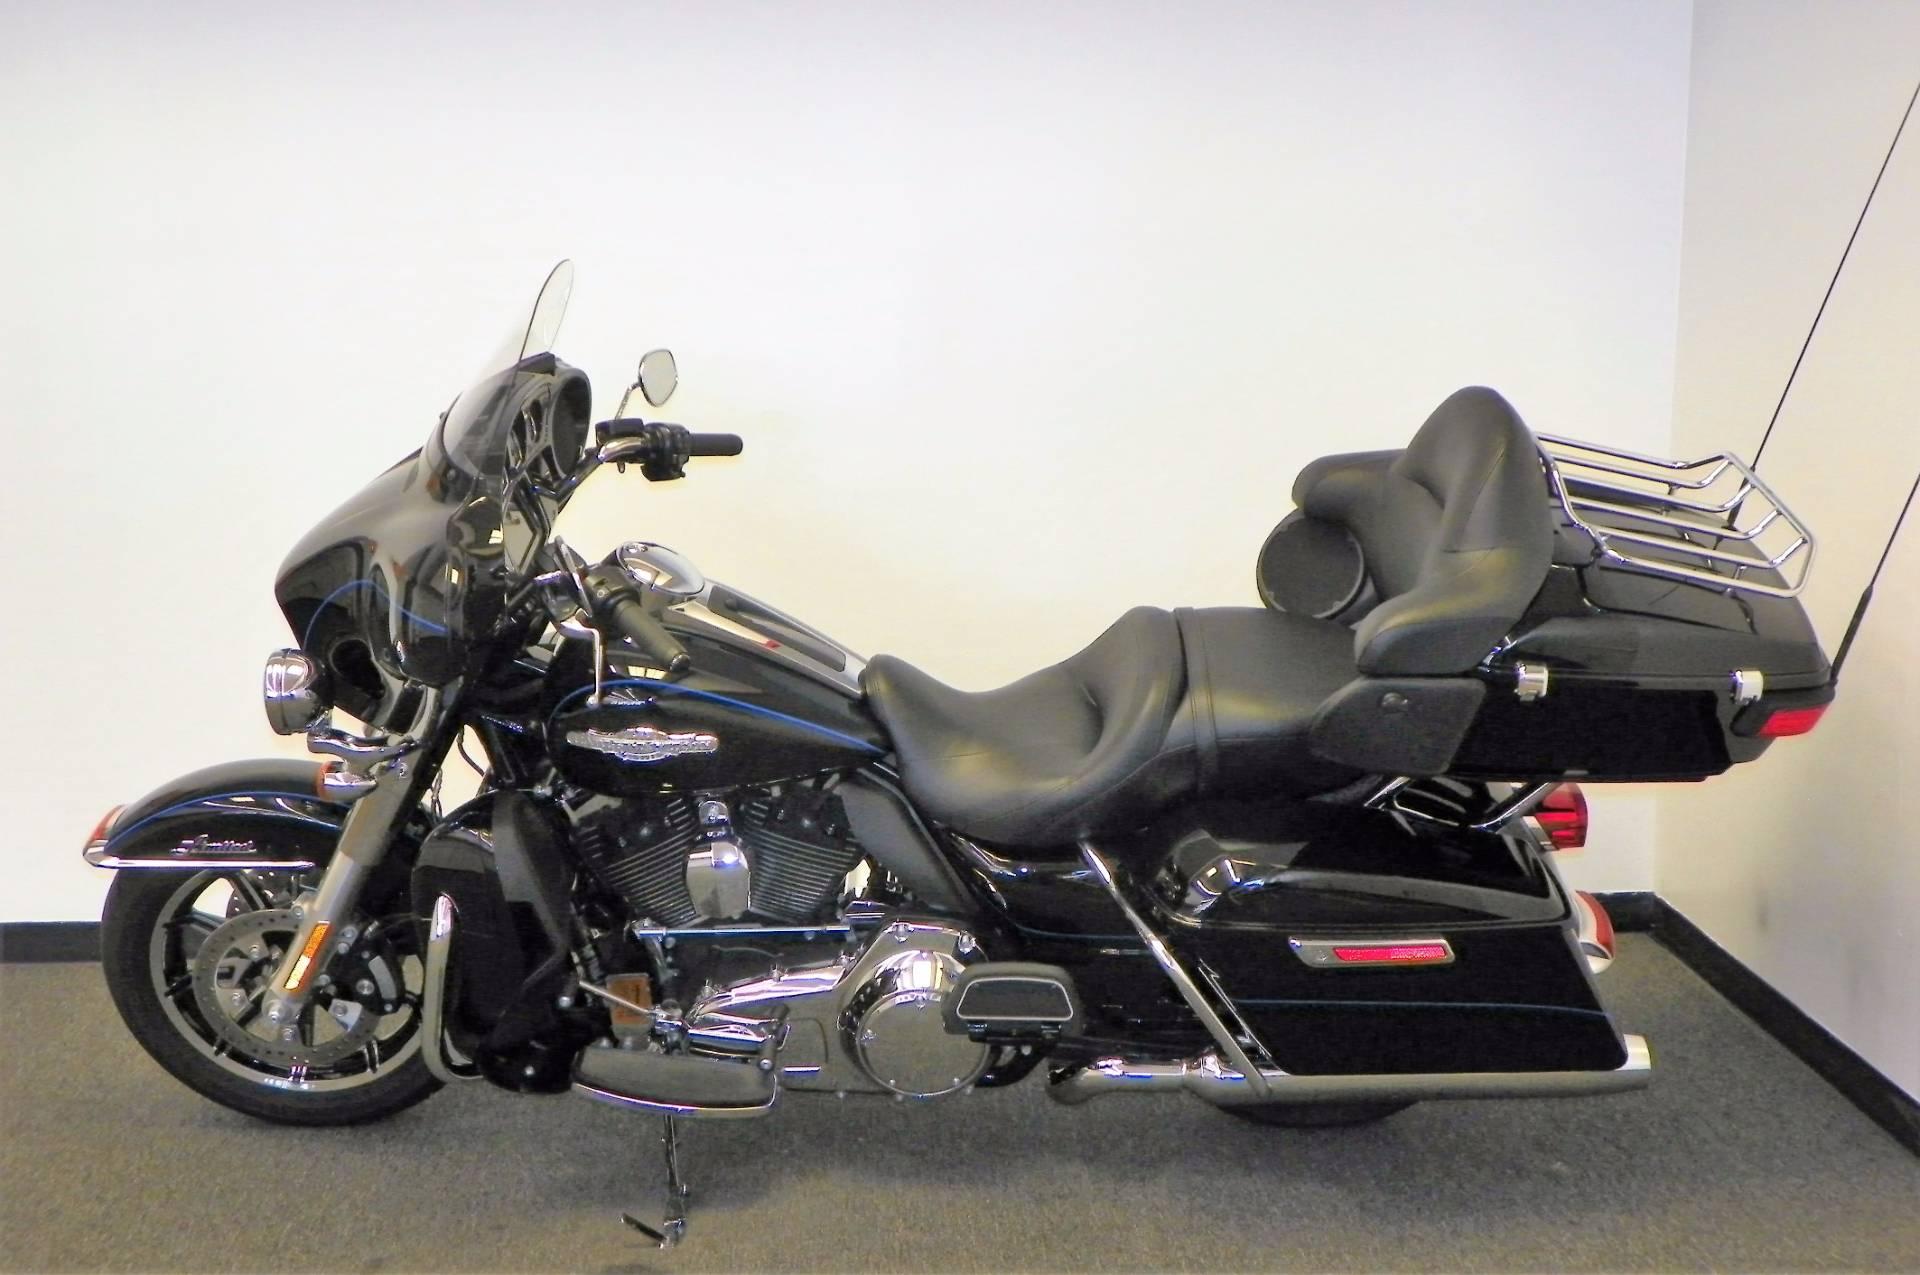 2014 Harley-Davidson Ultra Limited in Johnstown, Pennsylvania